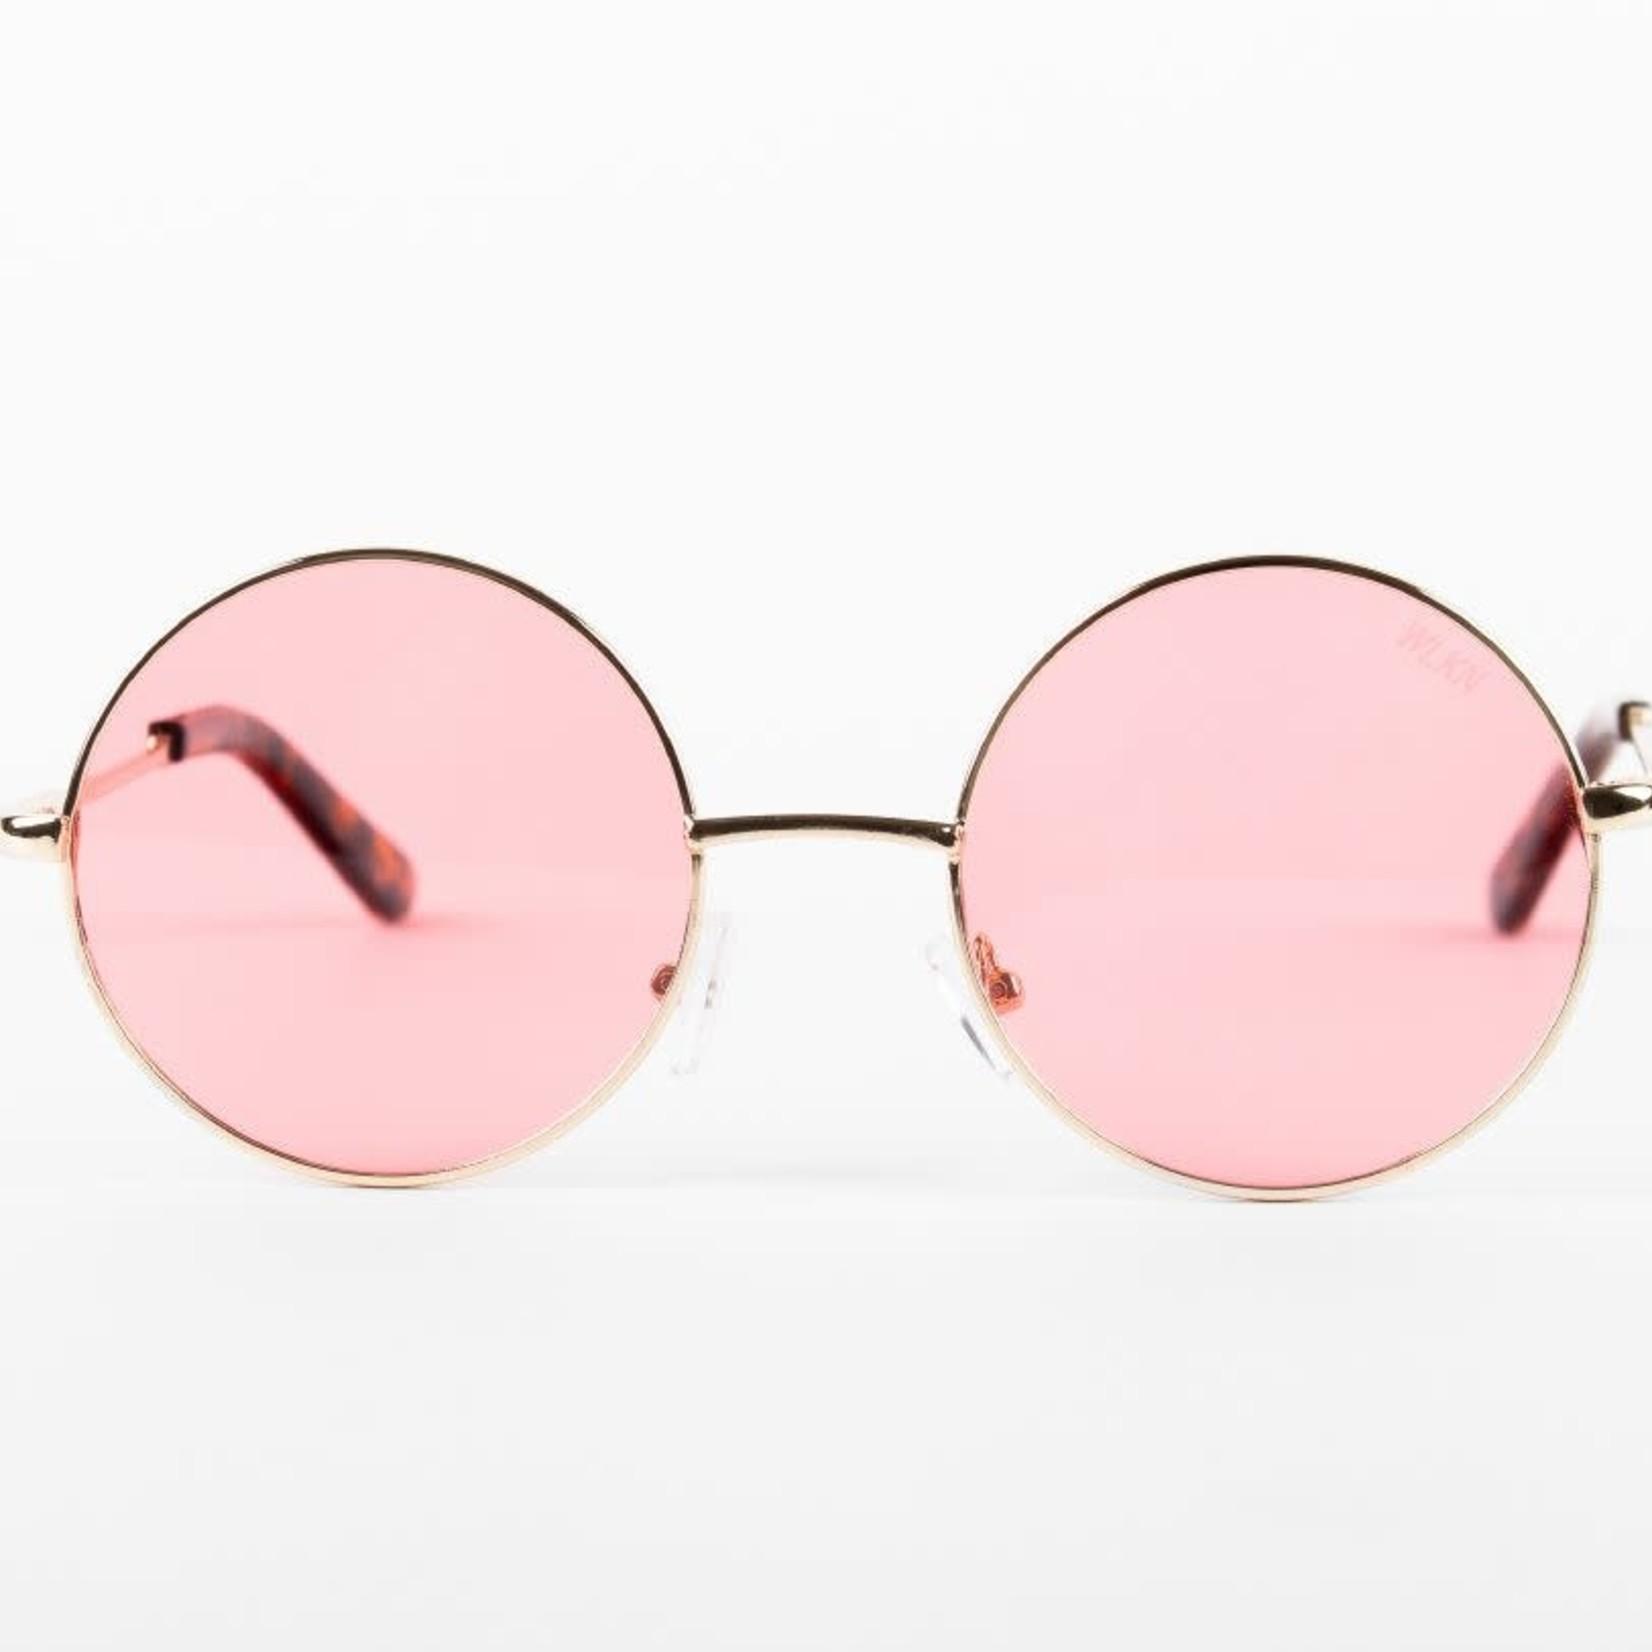 WLKN WLKN : Jones Sunglasses